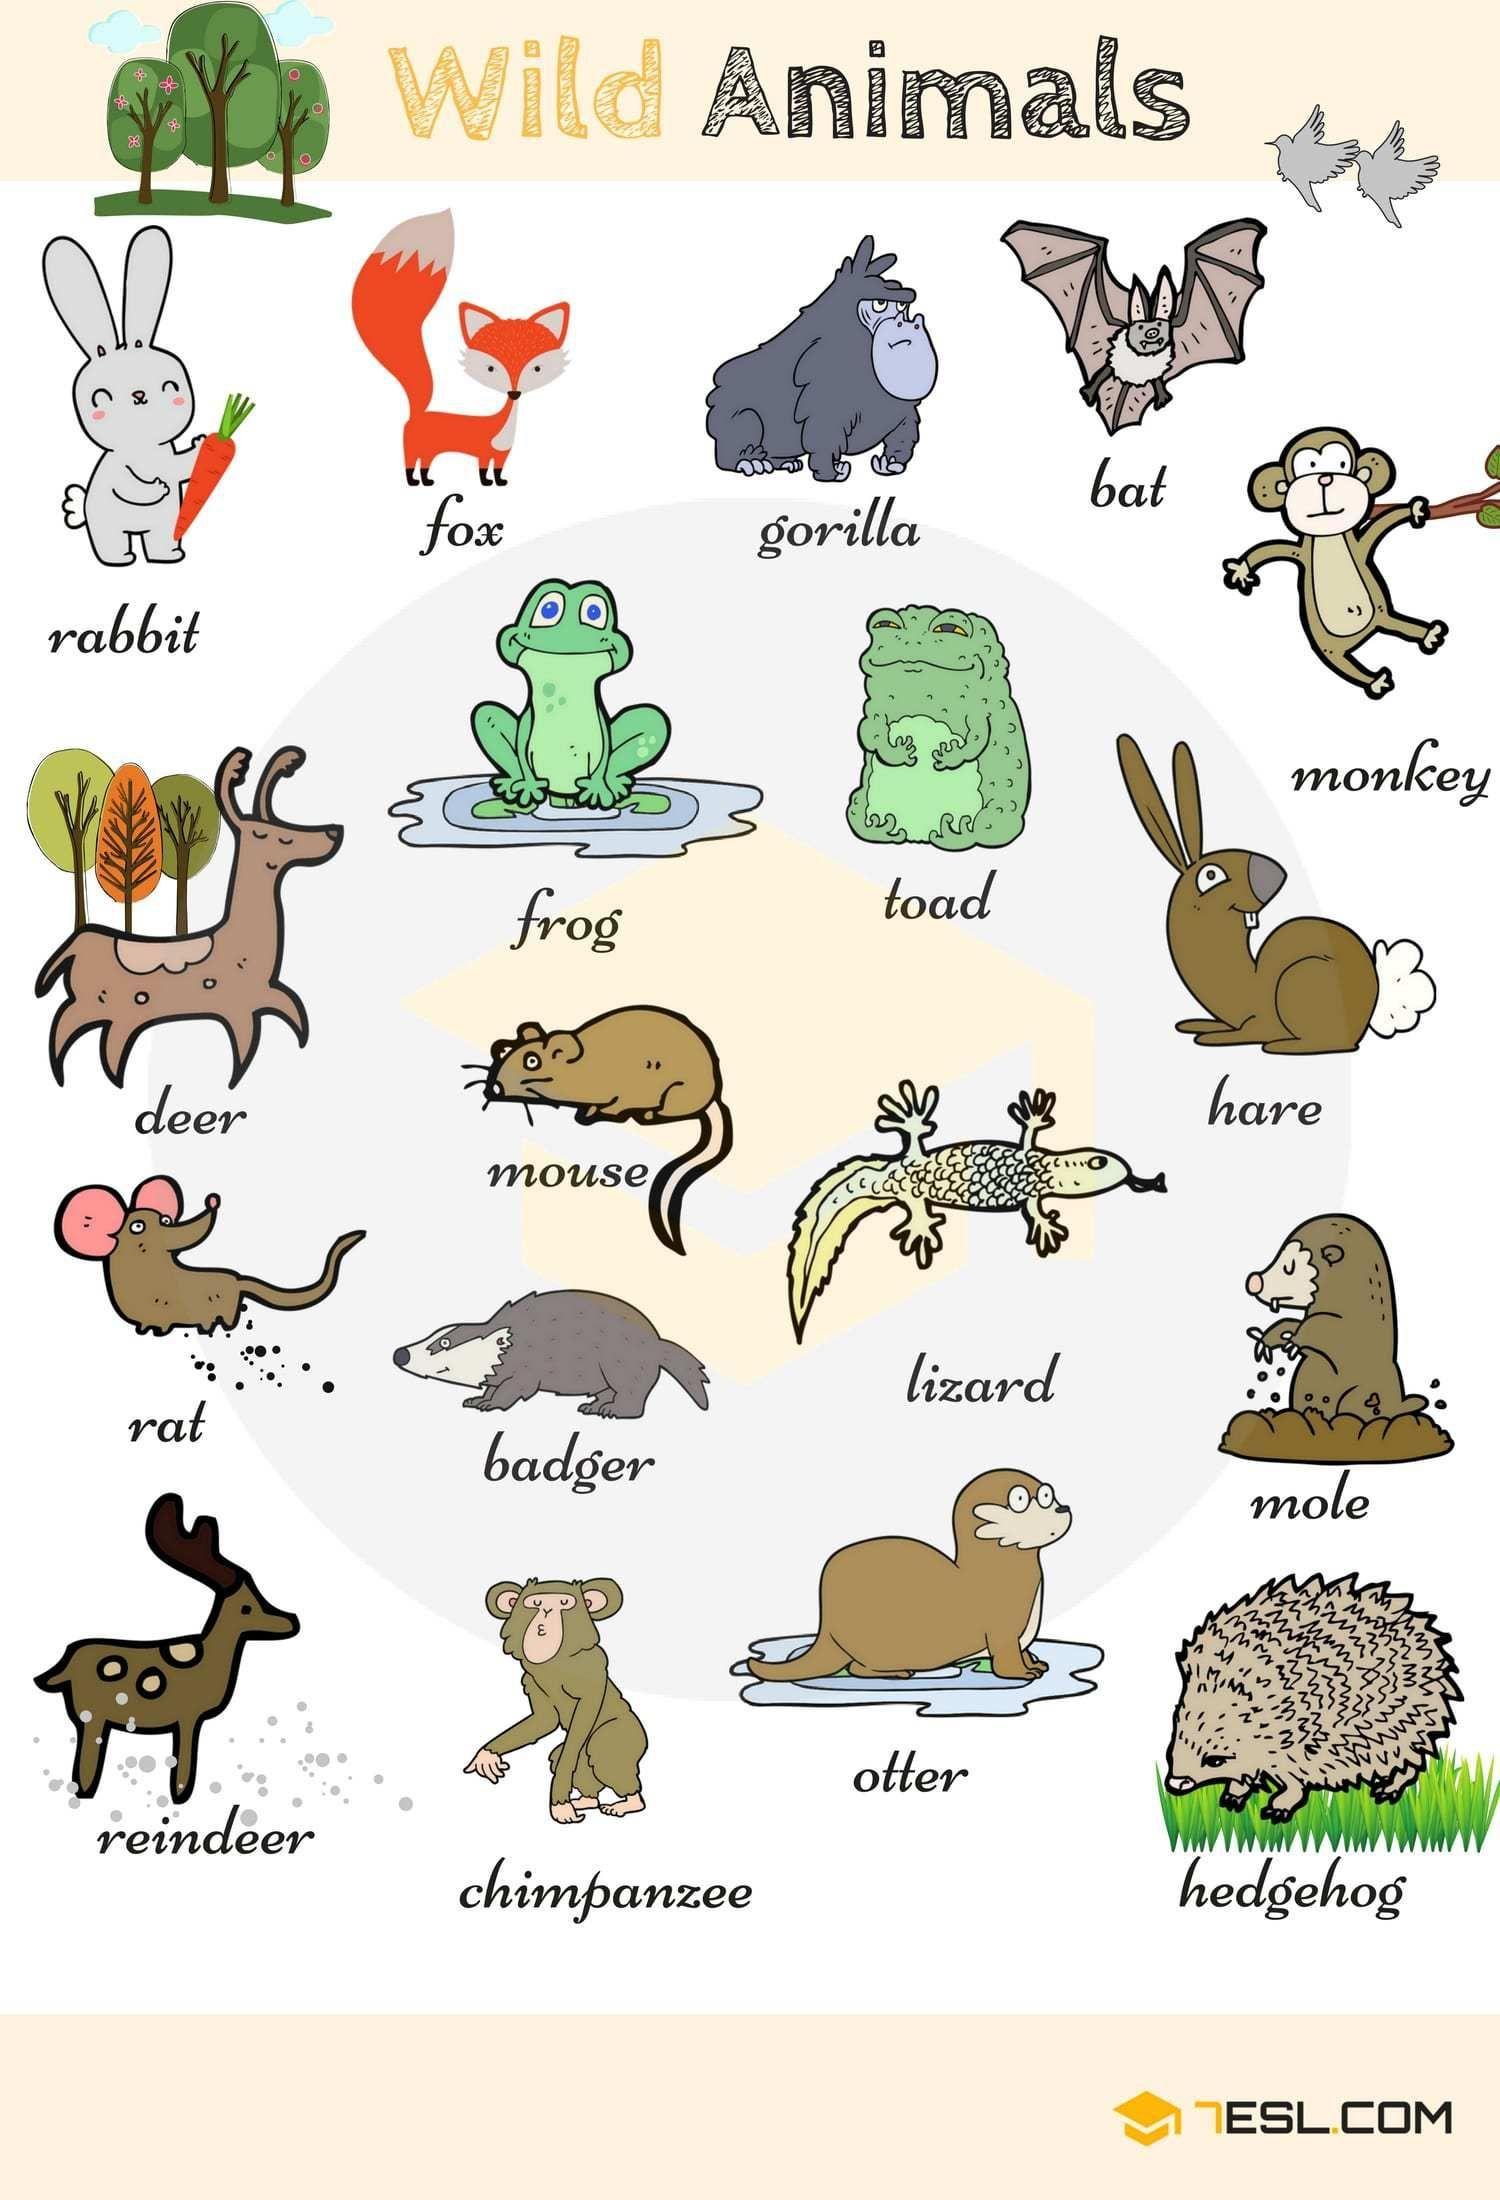 Wild Animal Vocabulary In English Animals Name In English English Vocabulary Learn English